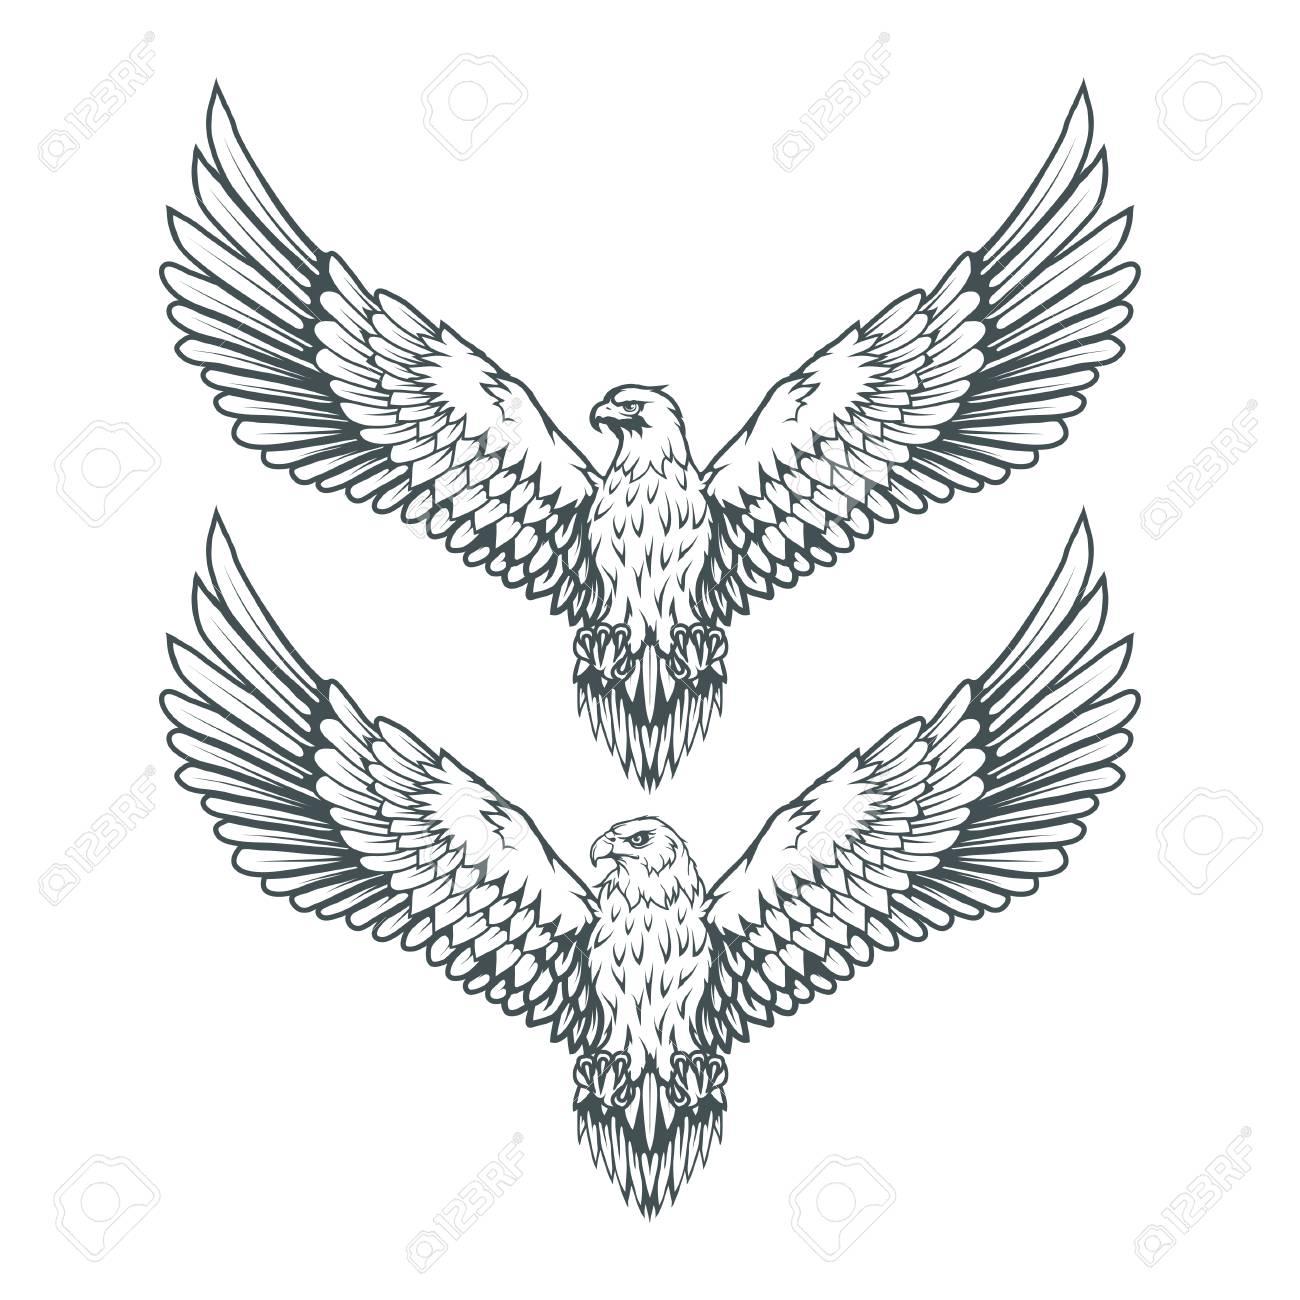 Set of eagles bald eagle logo wild birds drawing head of an eagle